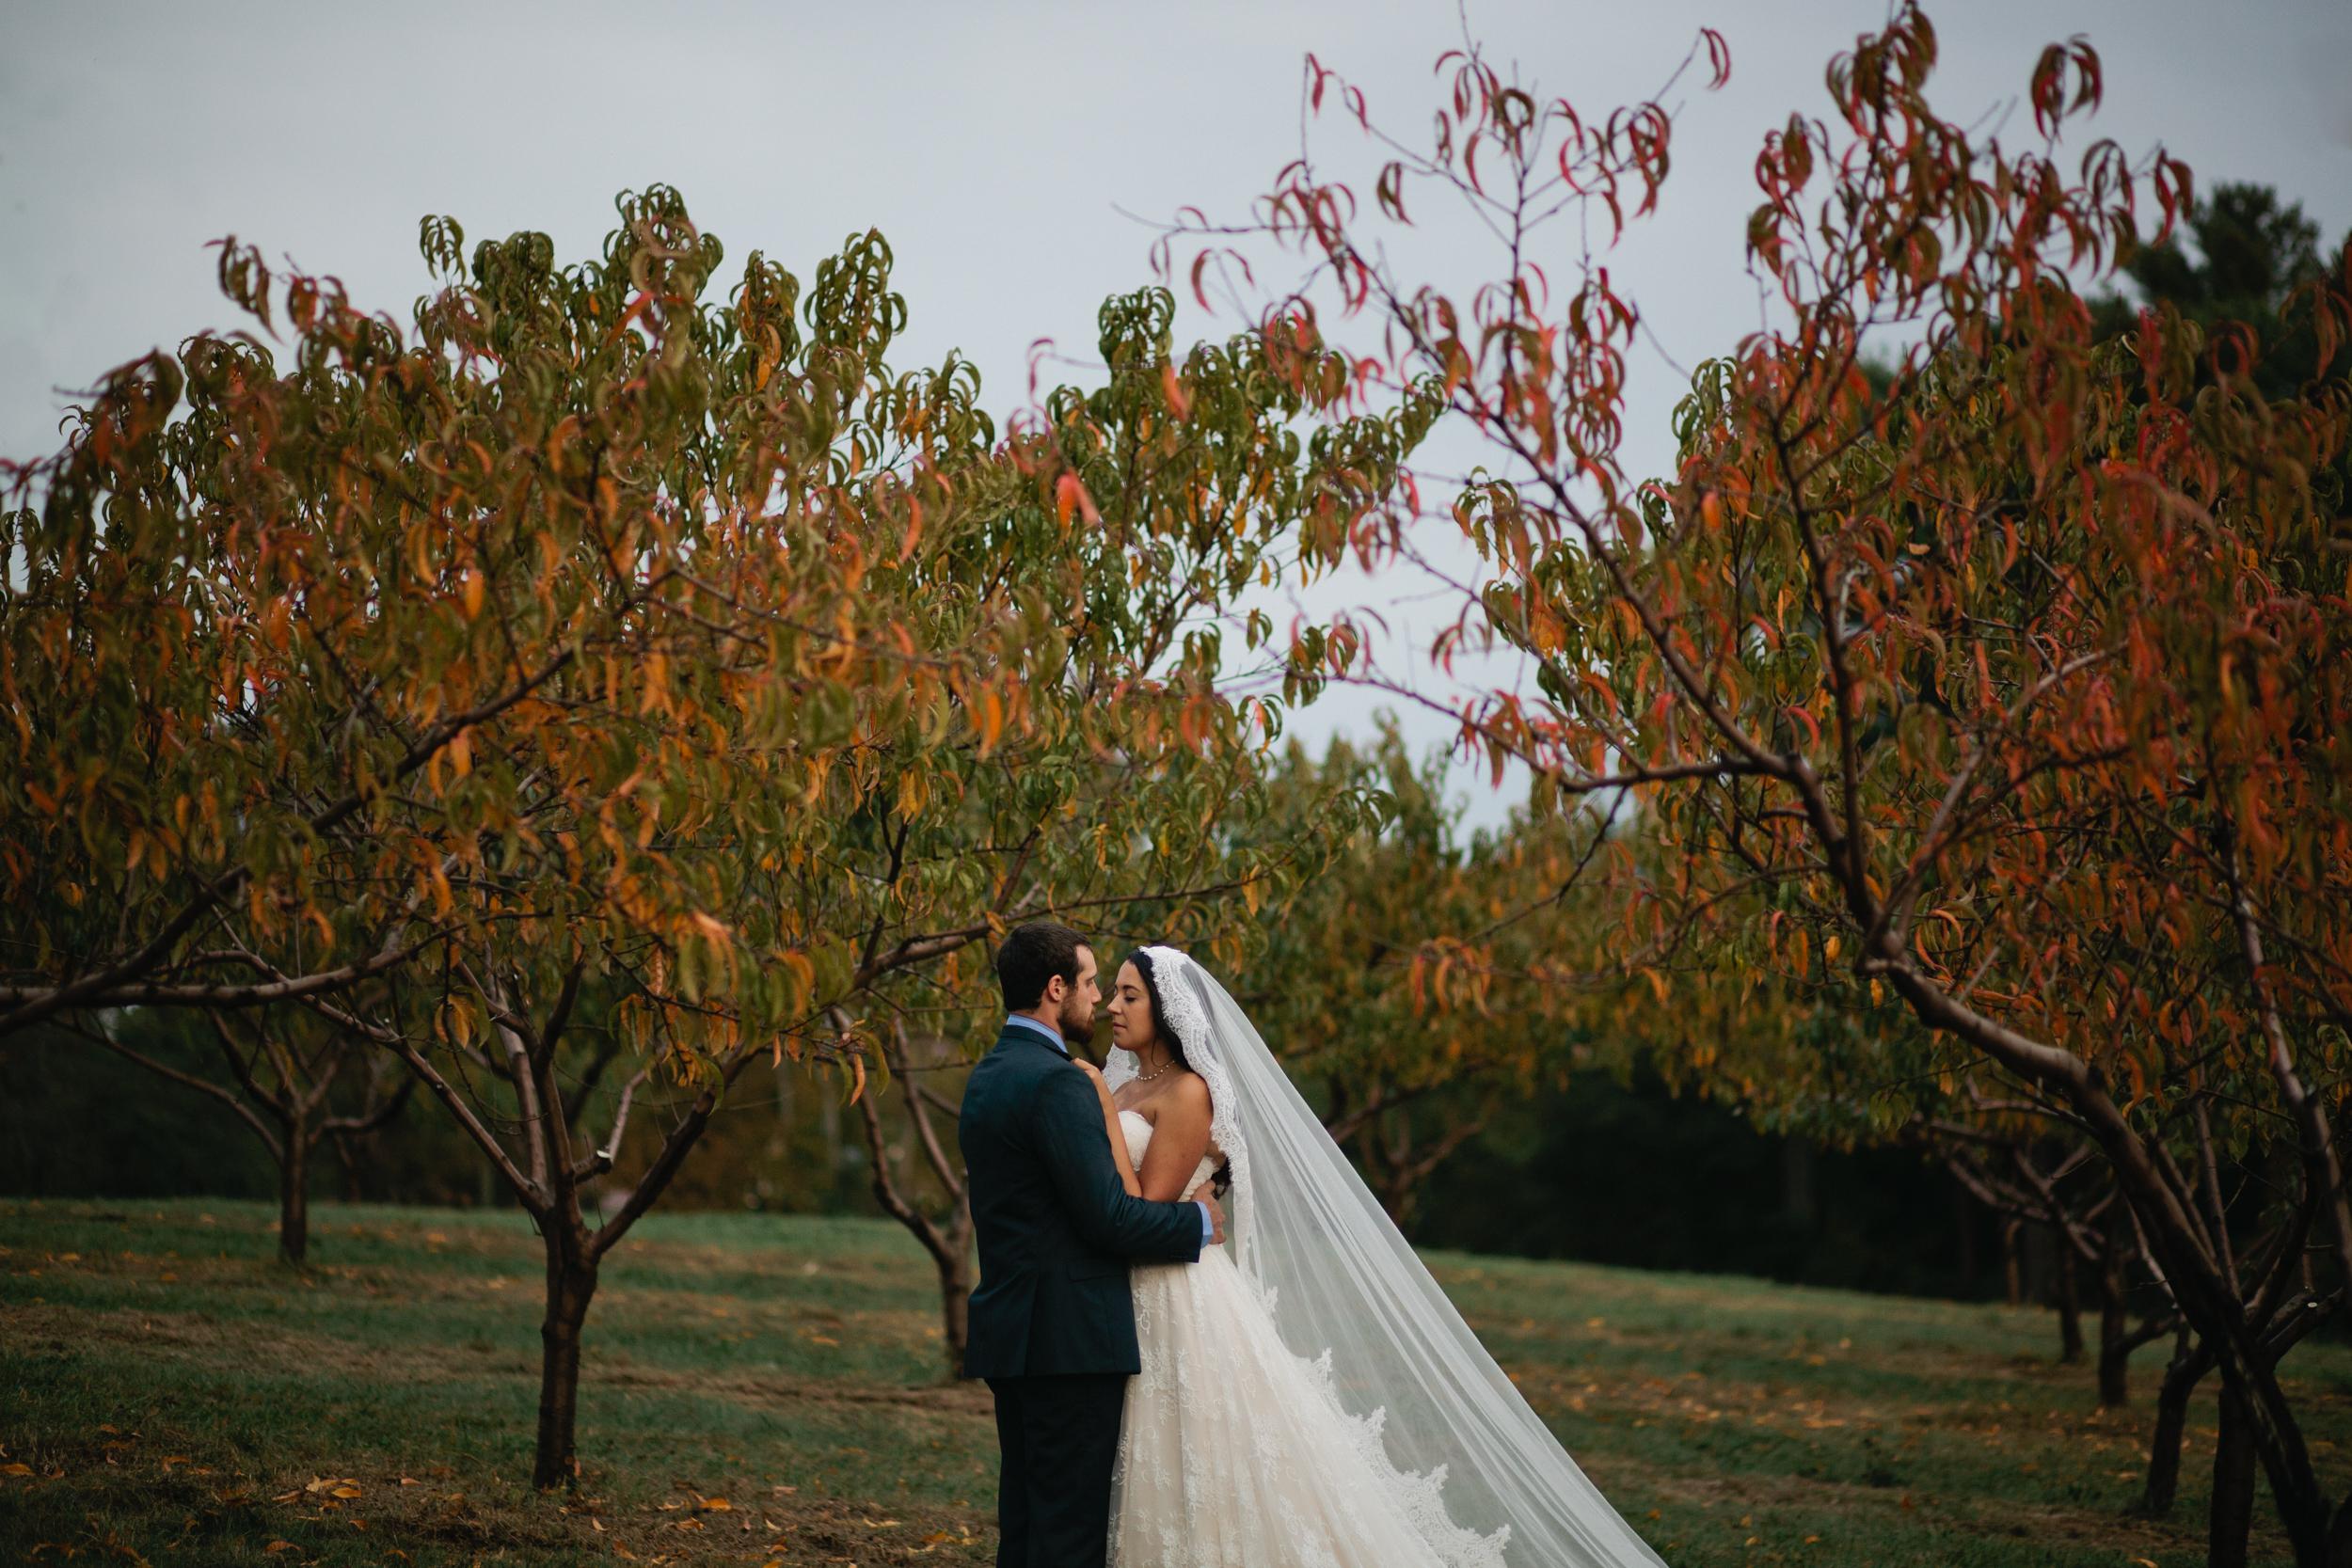 Best-Maine-Wedding-Photographer-1093.jpg